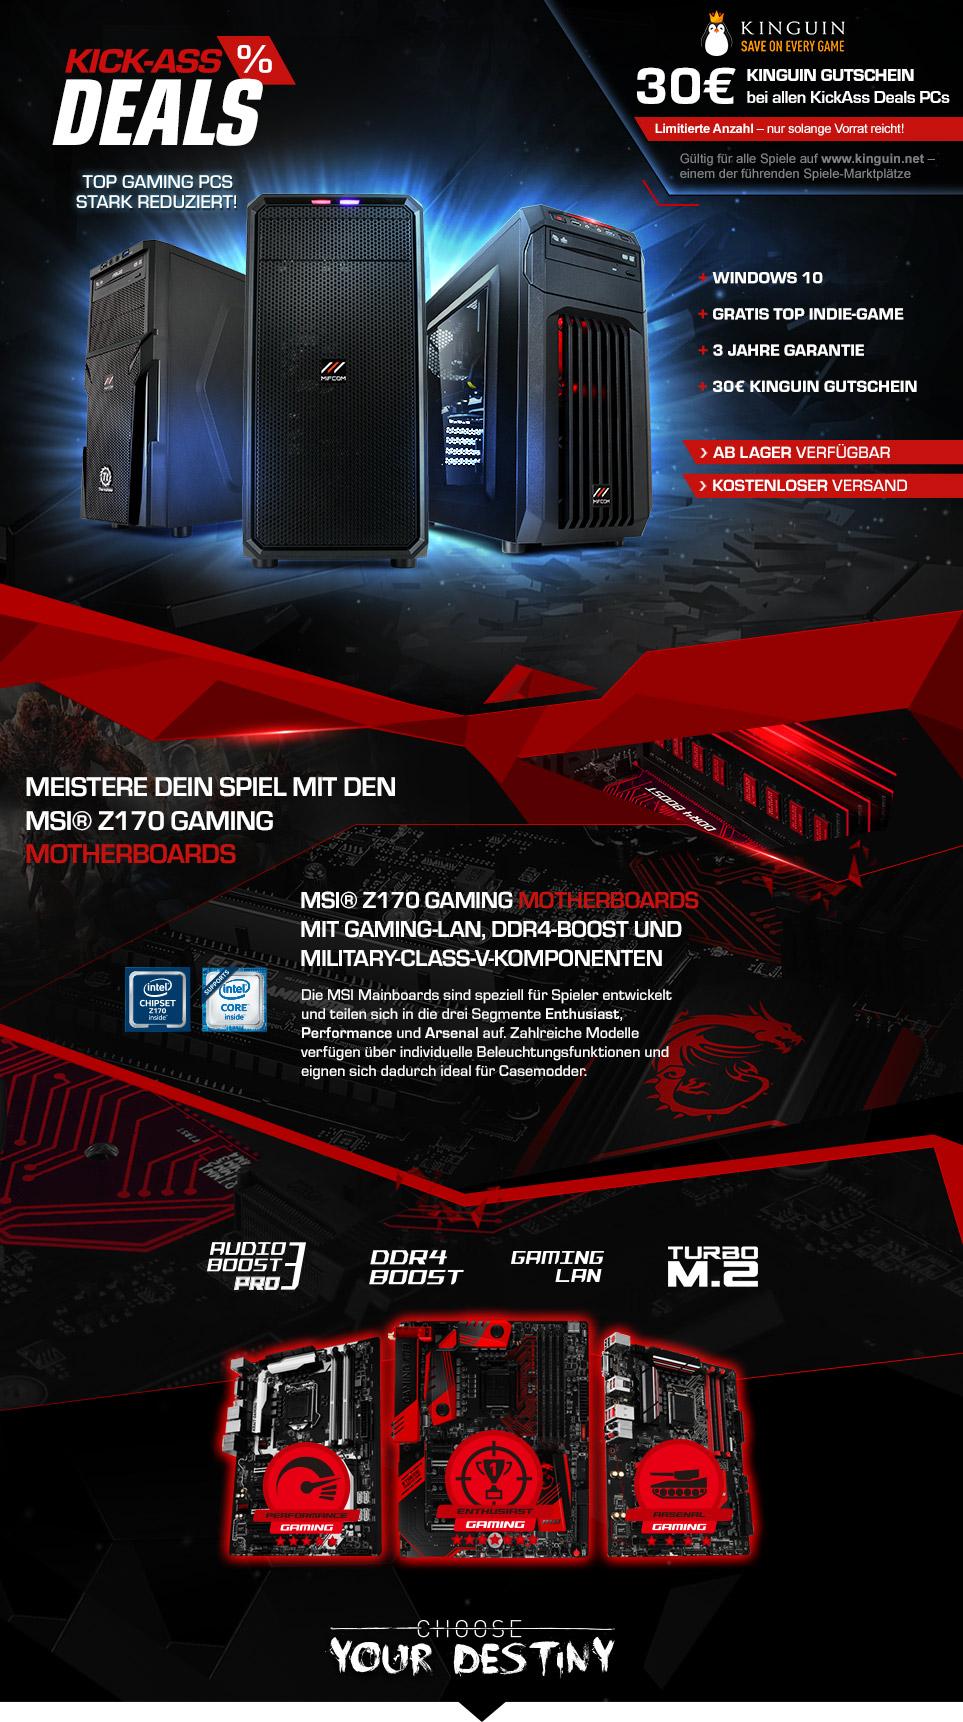 Kickass Deals PC Angebote